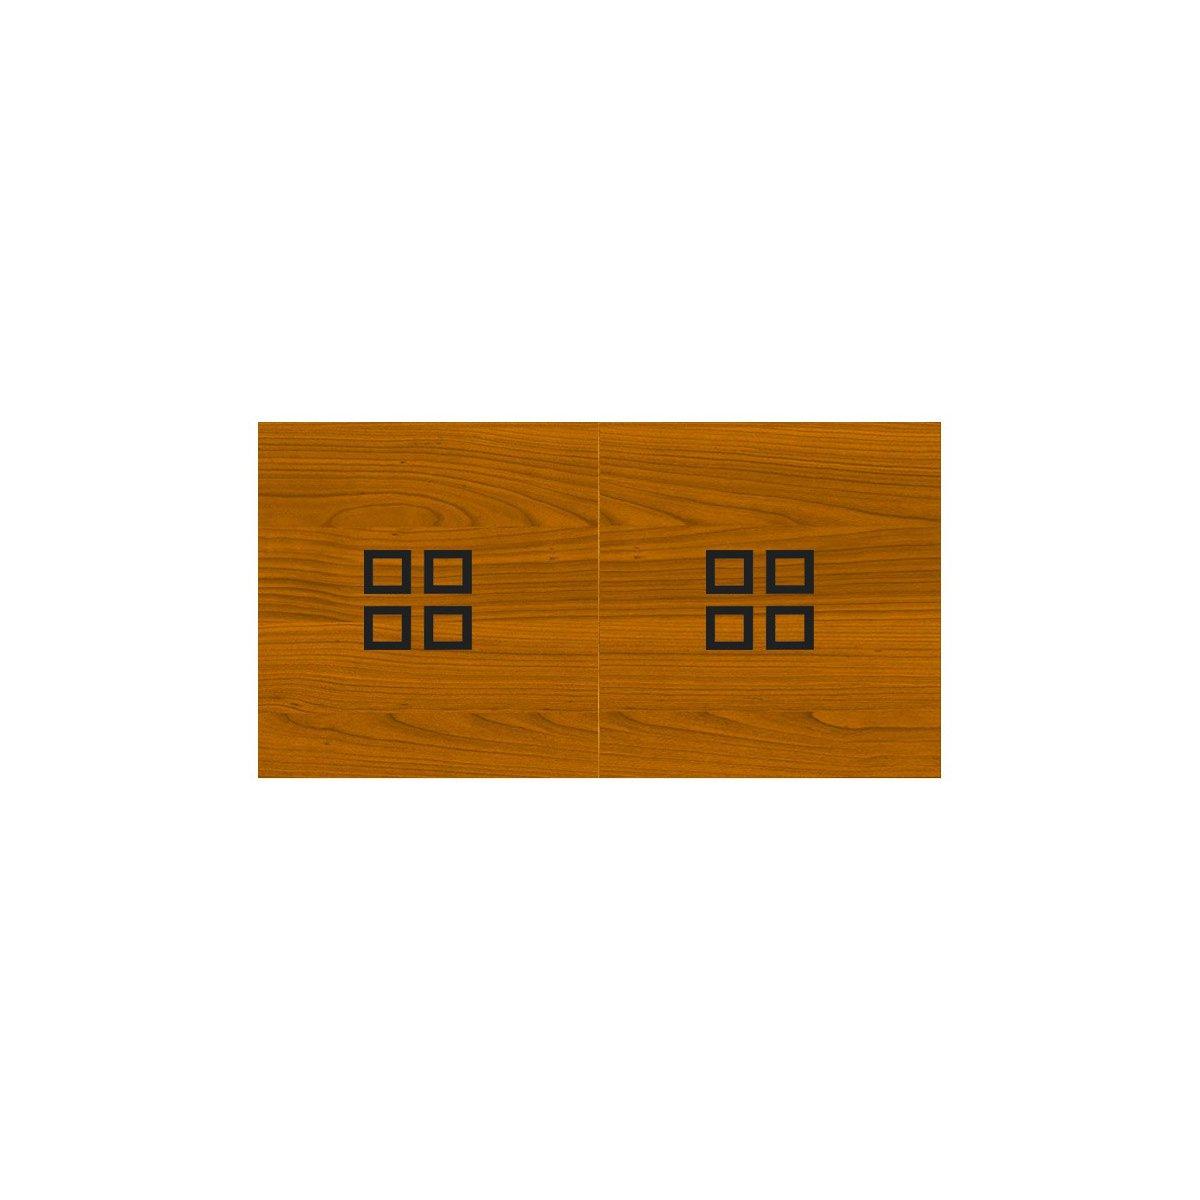 Plateau billard en bois Merisier avec carré peint en noir pour table billar -> Plateau Merisier